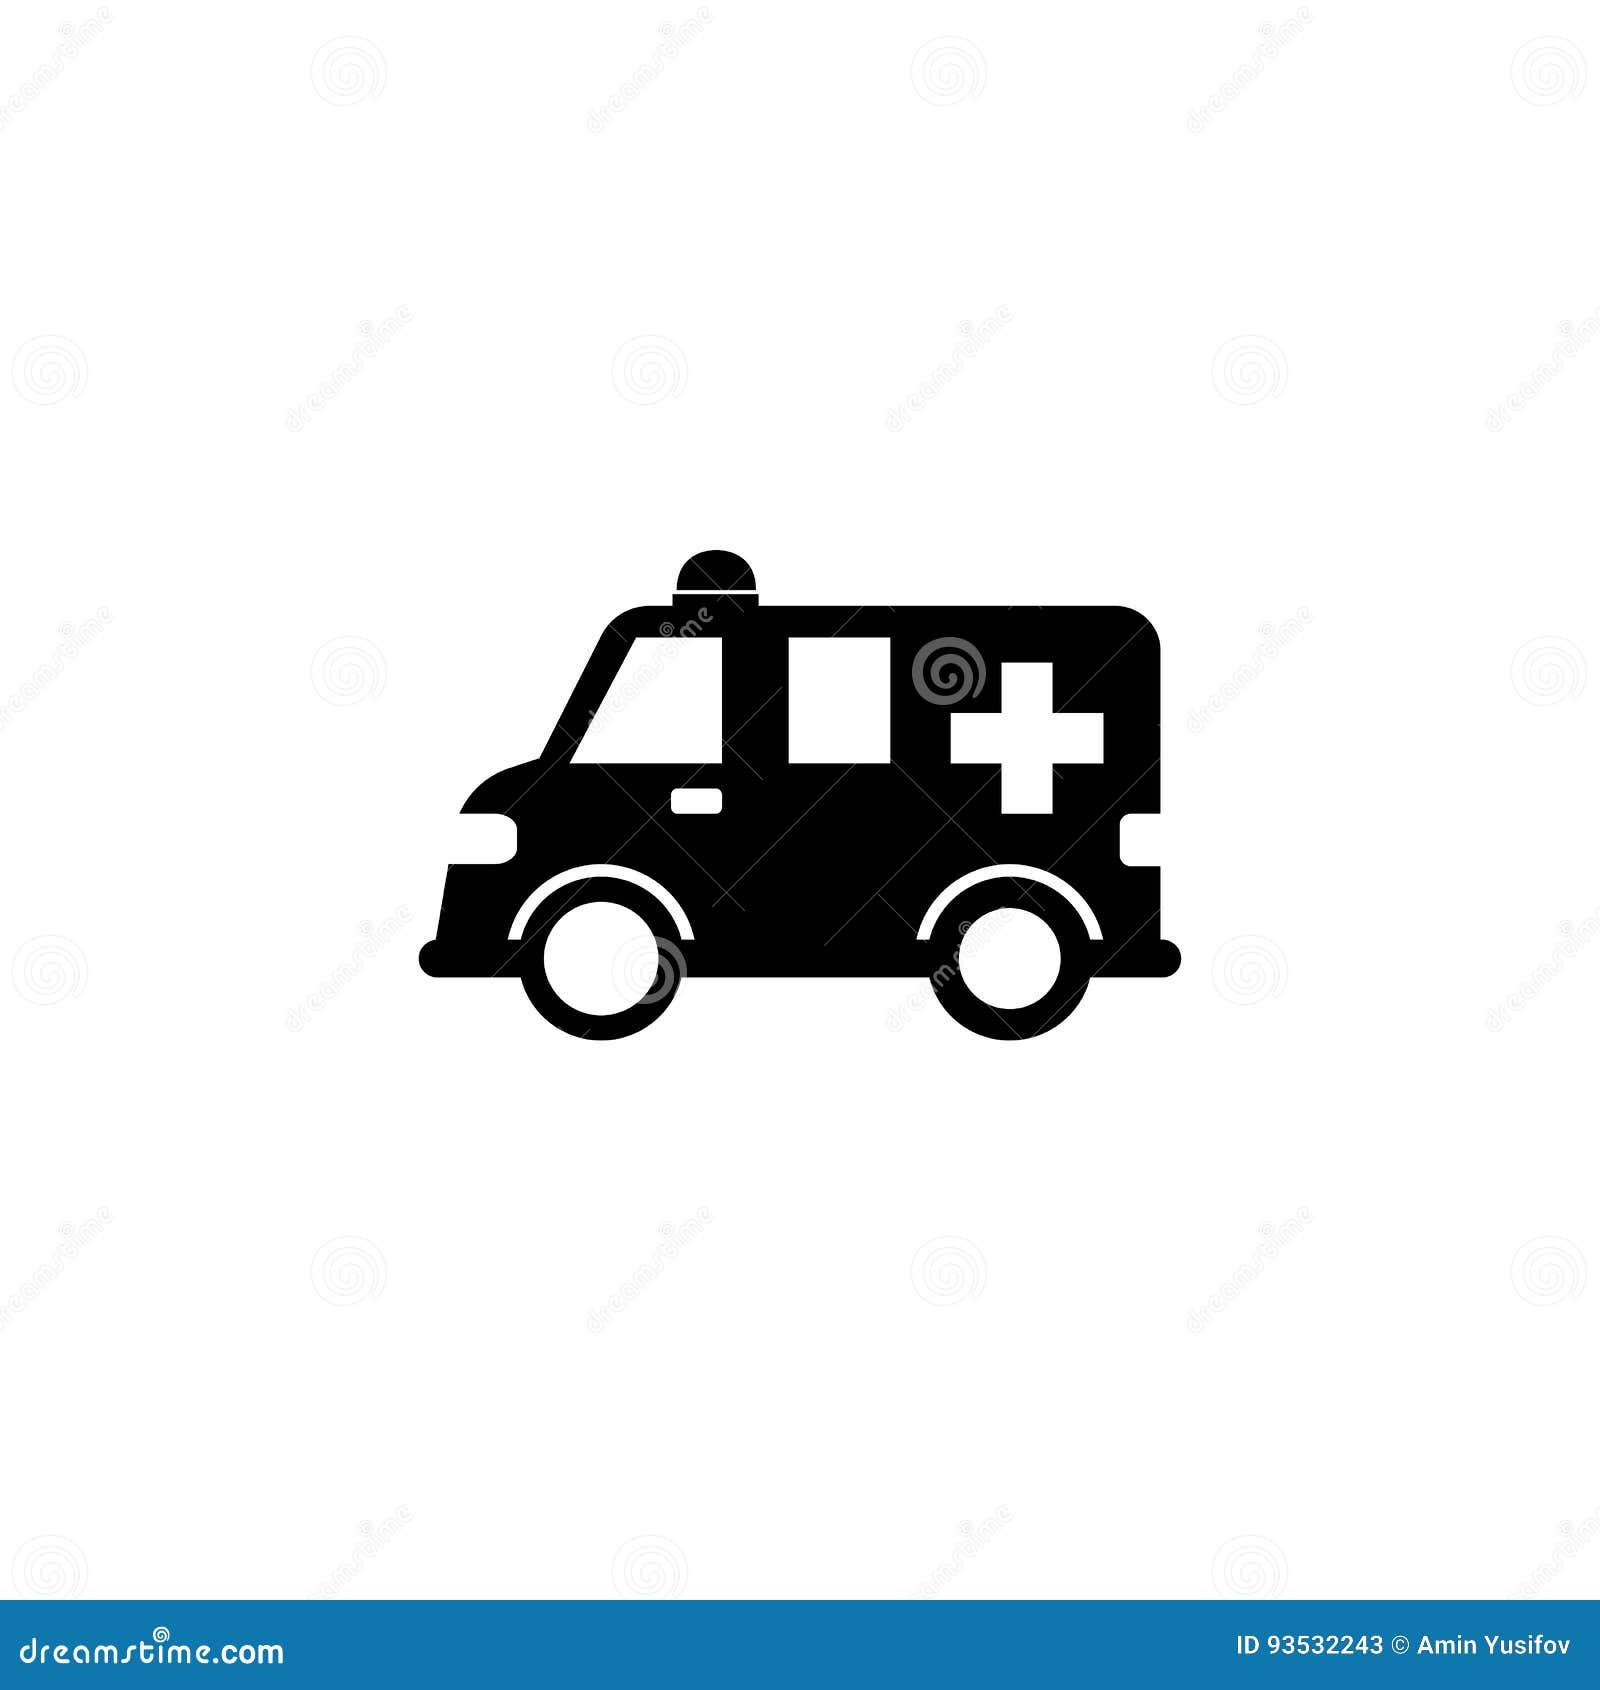 ic ne solide de voiture d 39 ambulance signe de healtcare illustration de vecteur illustration. Black Bedroom Furniture Sets. Home Design Ideas